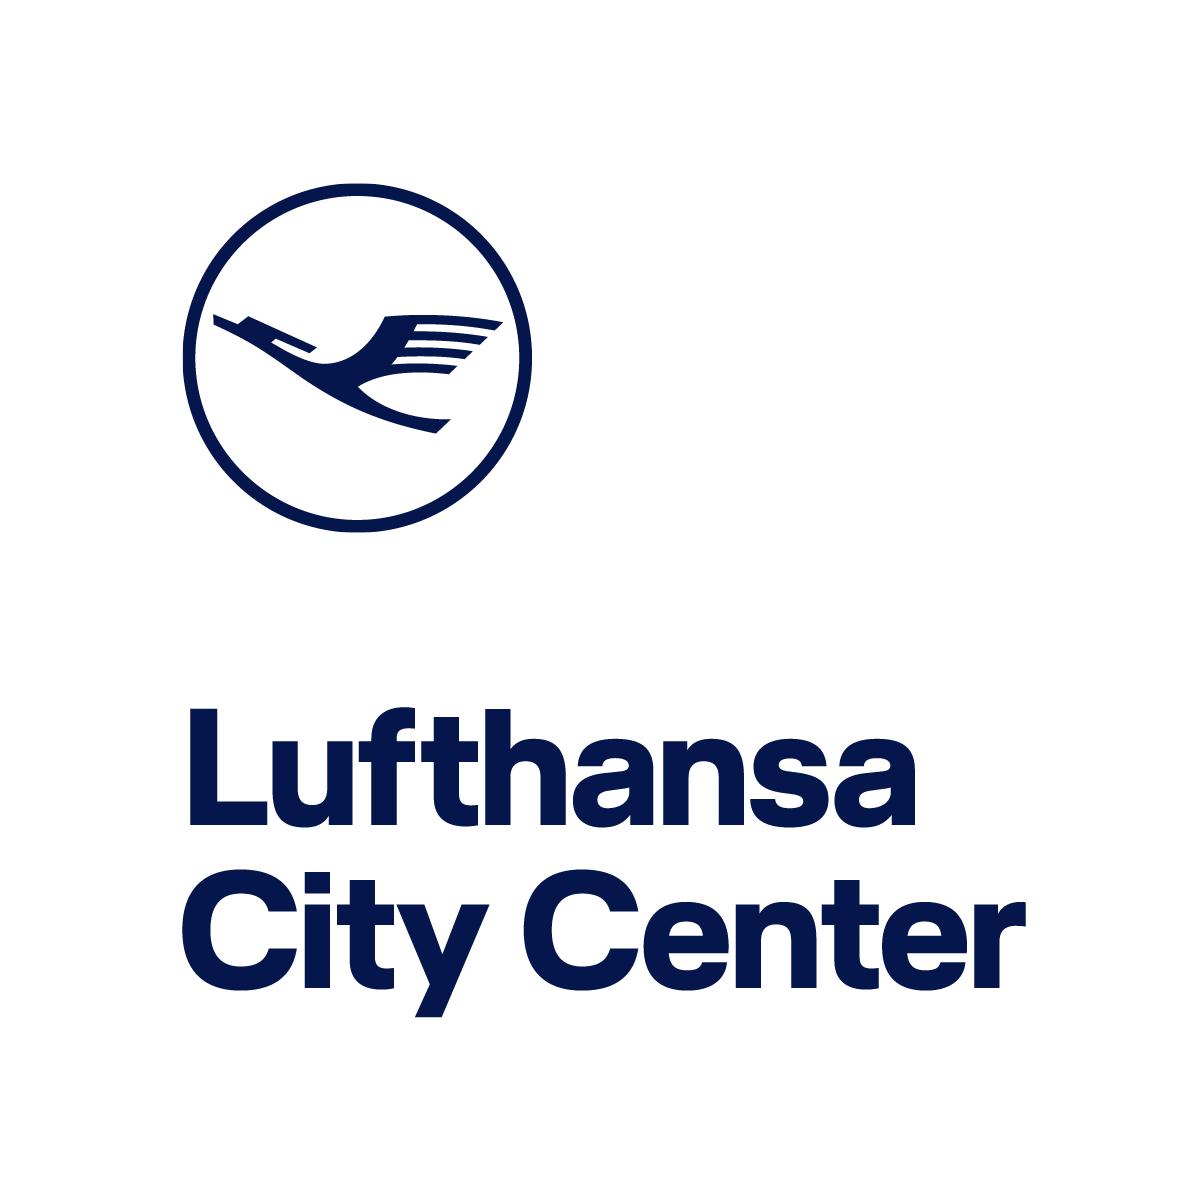 Reisebüro Lagraff Lufthansa City Center